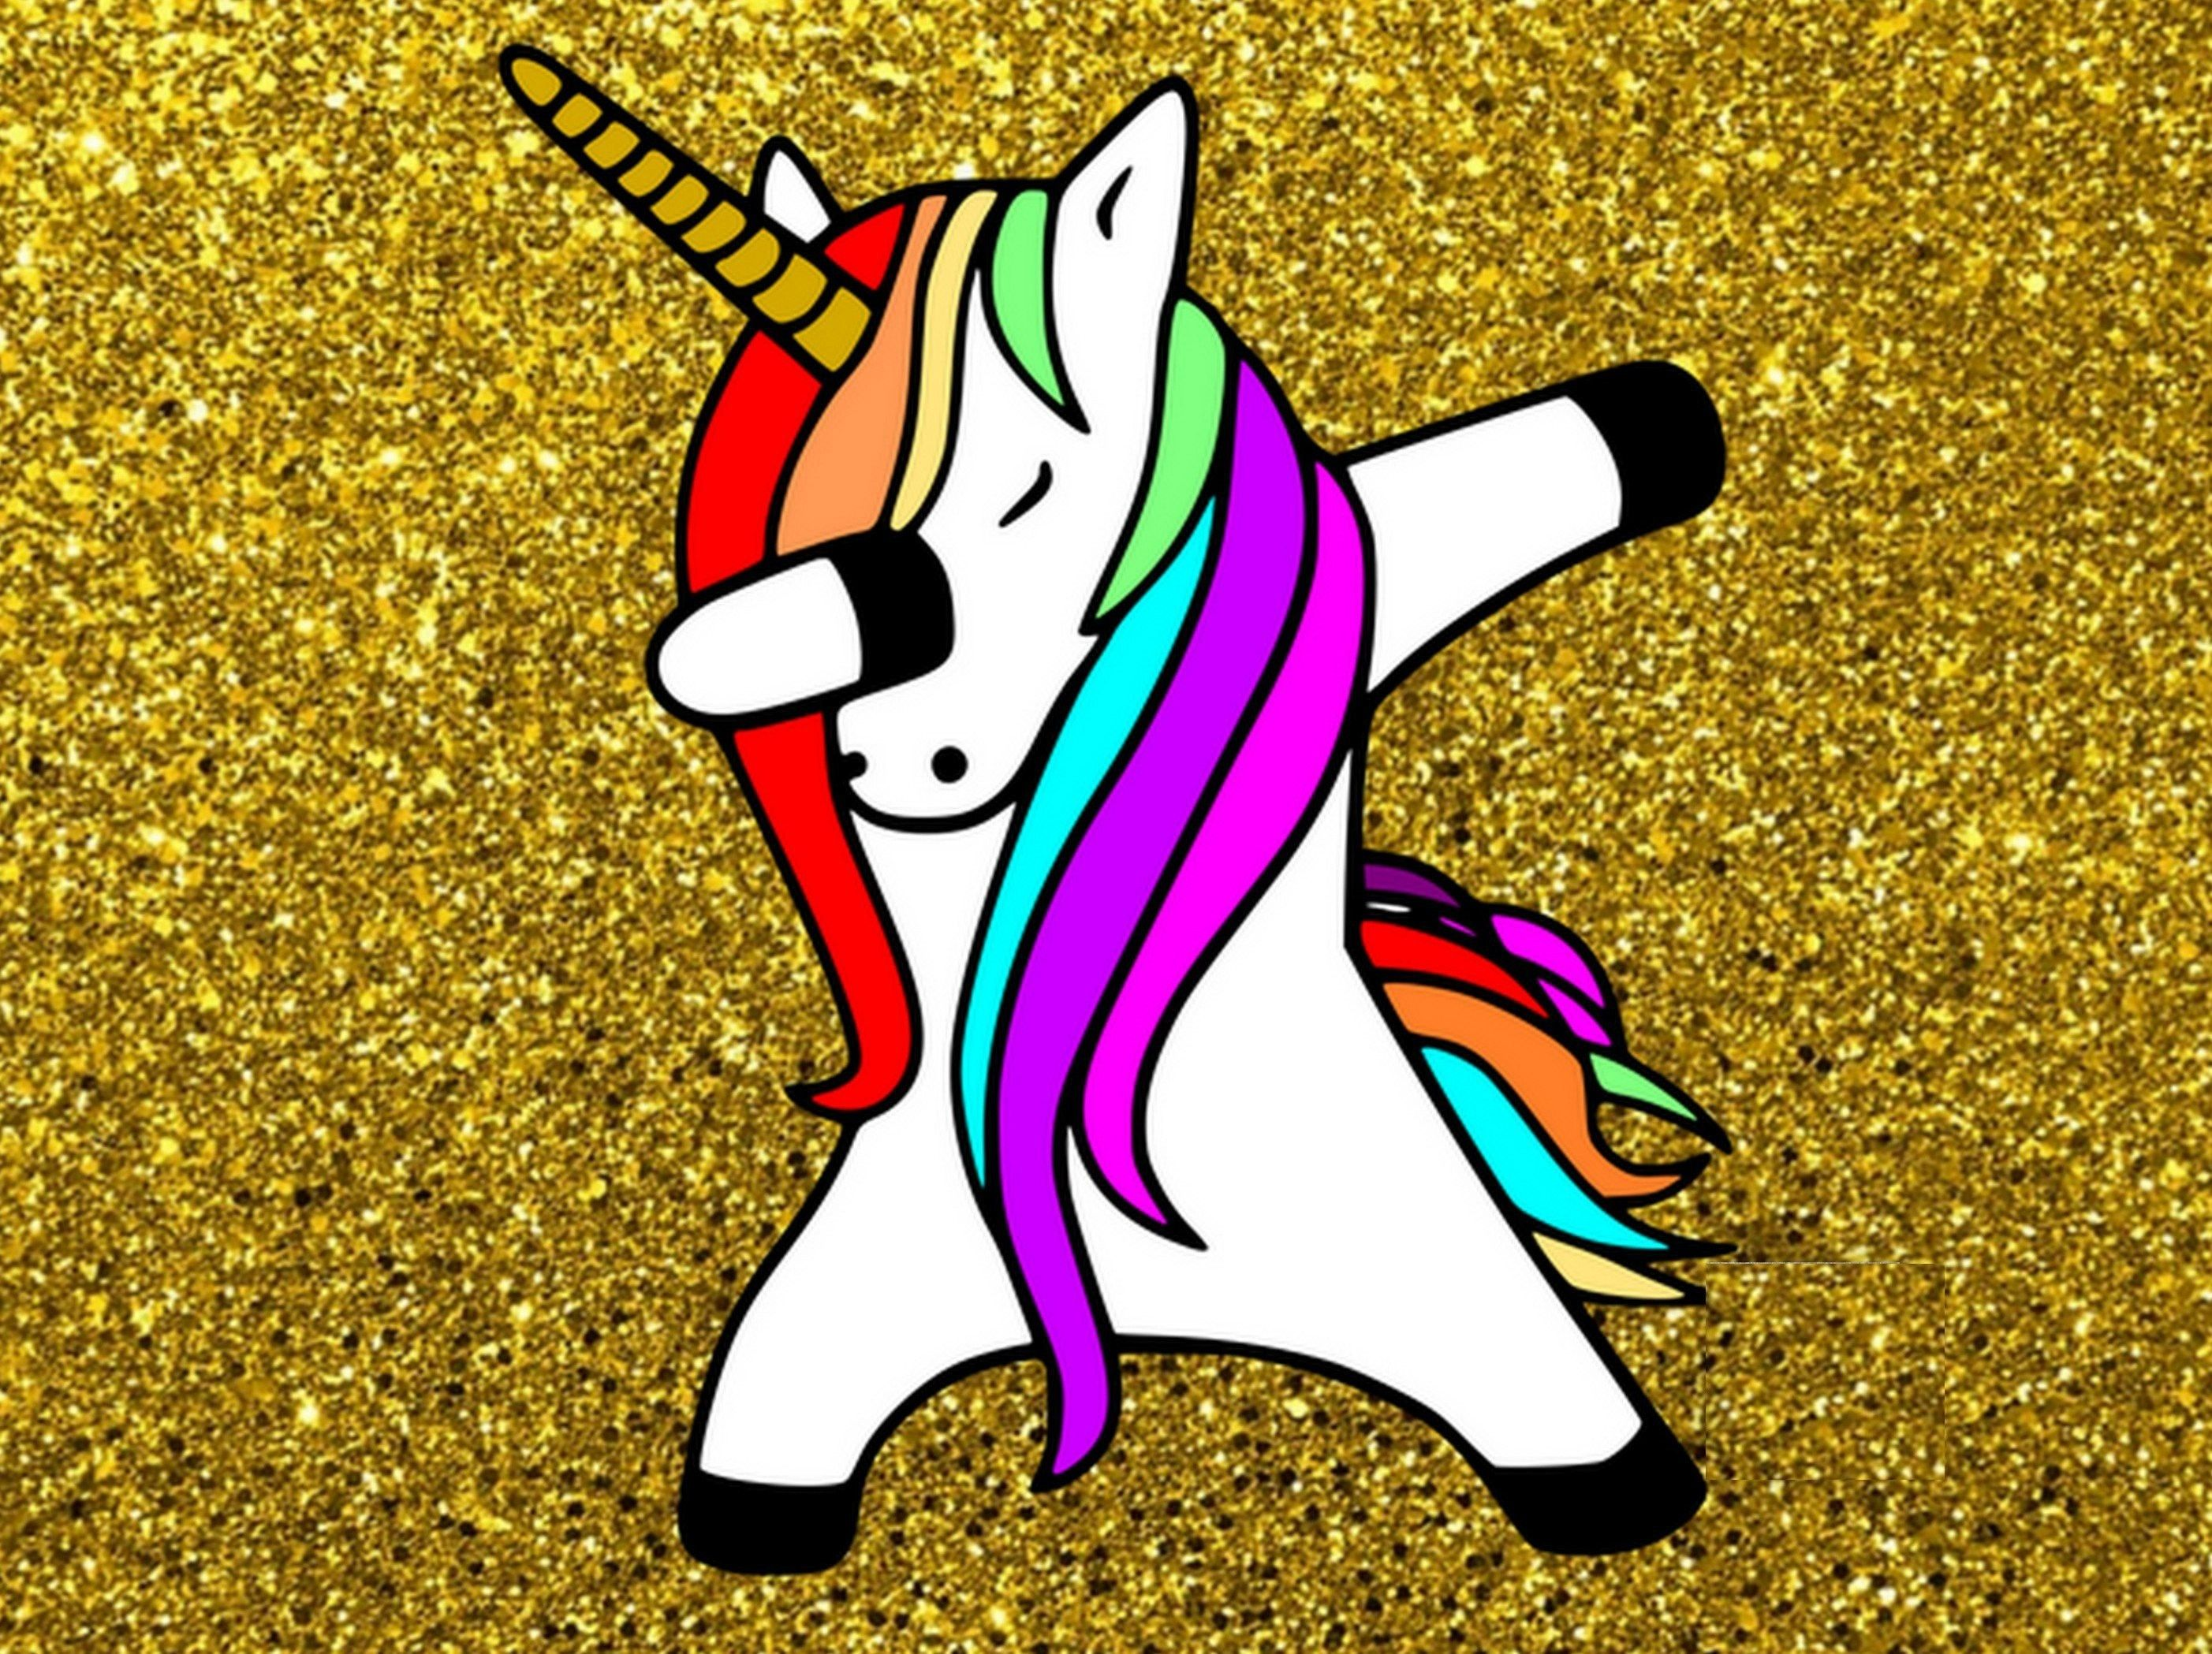 Unicorn Dabbing Wallpapers Top Free Unicorn Dabbing Backgrounds Wallpaperaccess